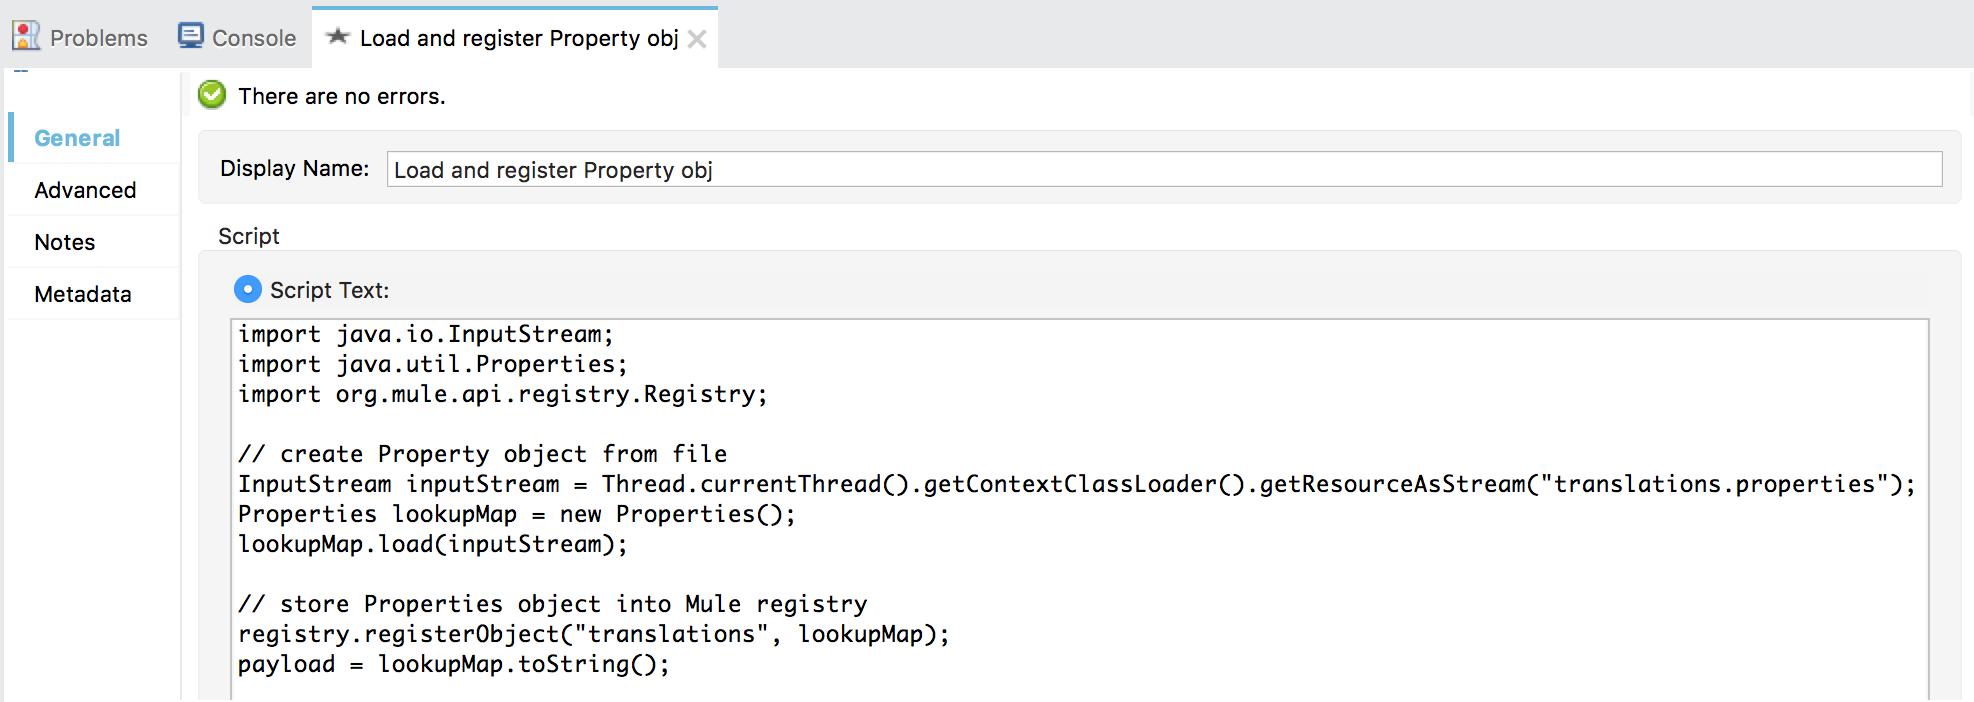 Groovy script to load properties into Mule registry